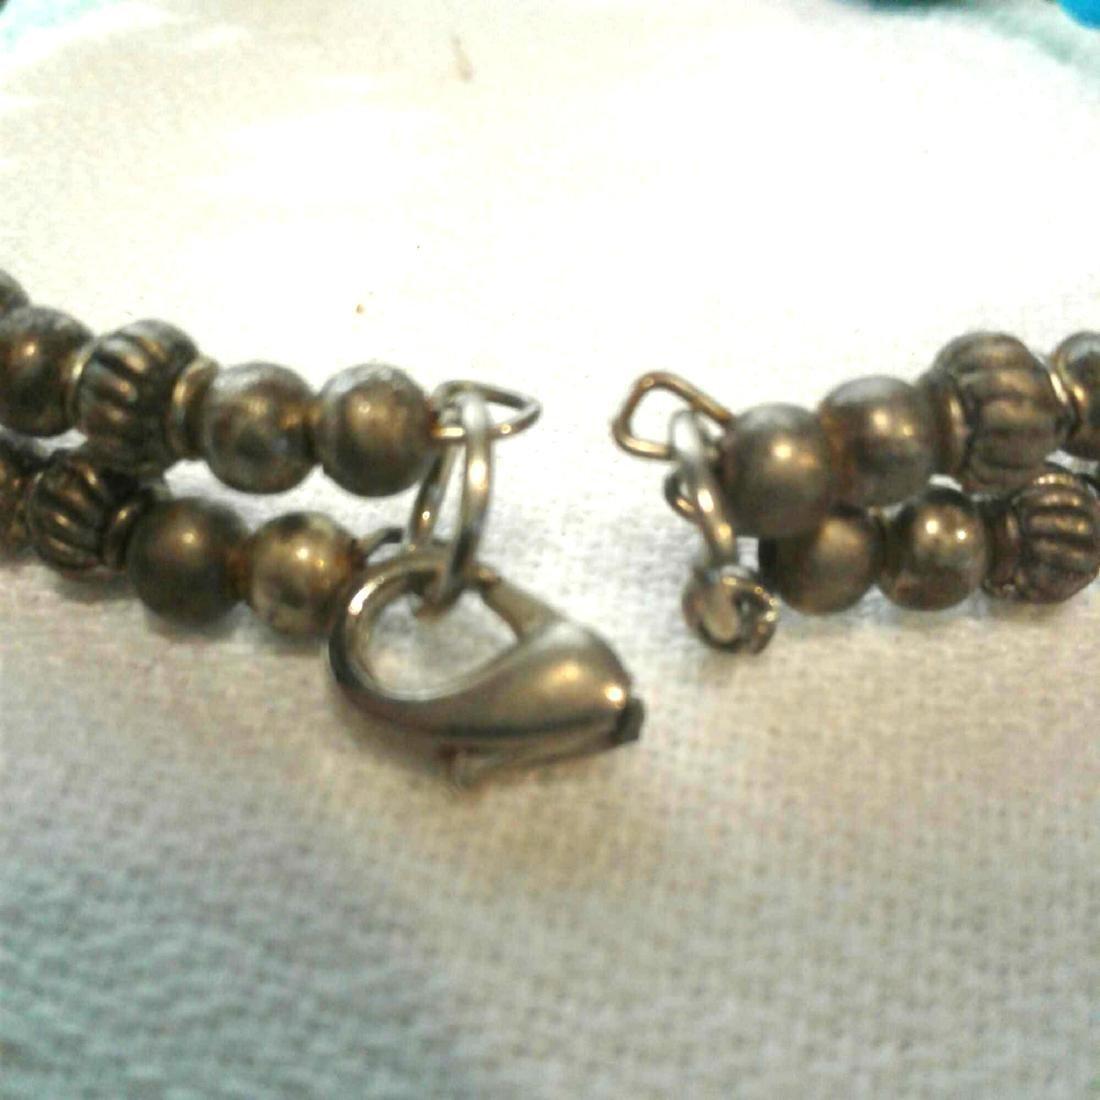 Turquoise Bracelet - 5